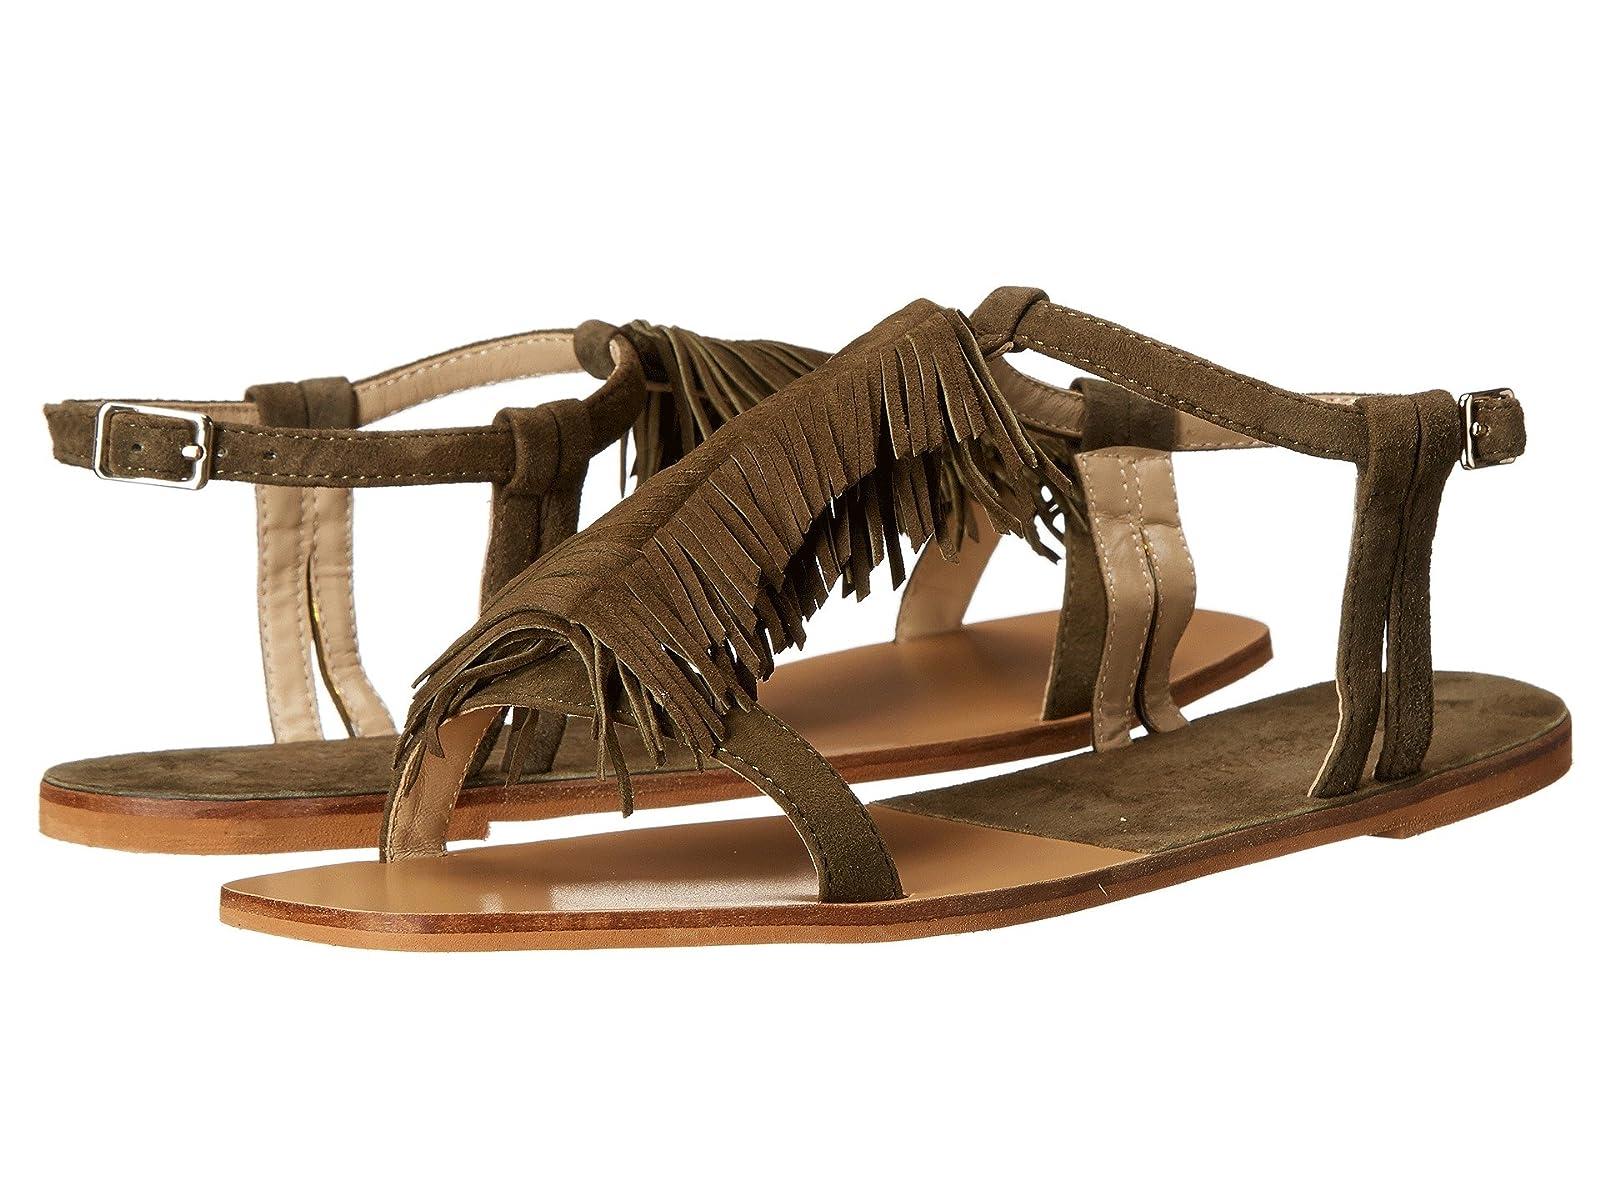 Kristin Cavallari Tommy Fringe SandalCheap and distinctive eye-catching shoes